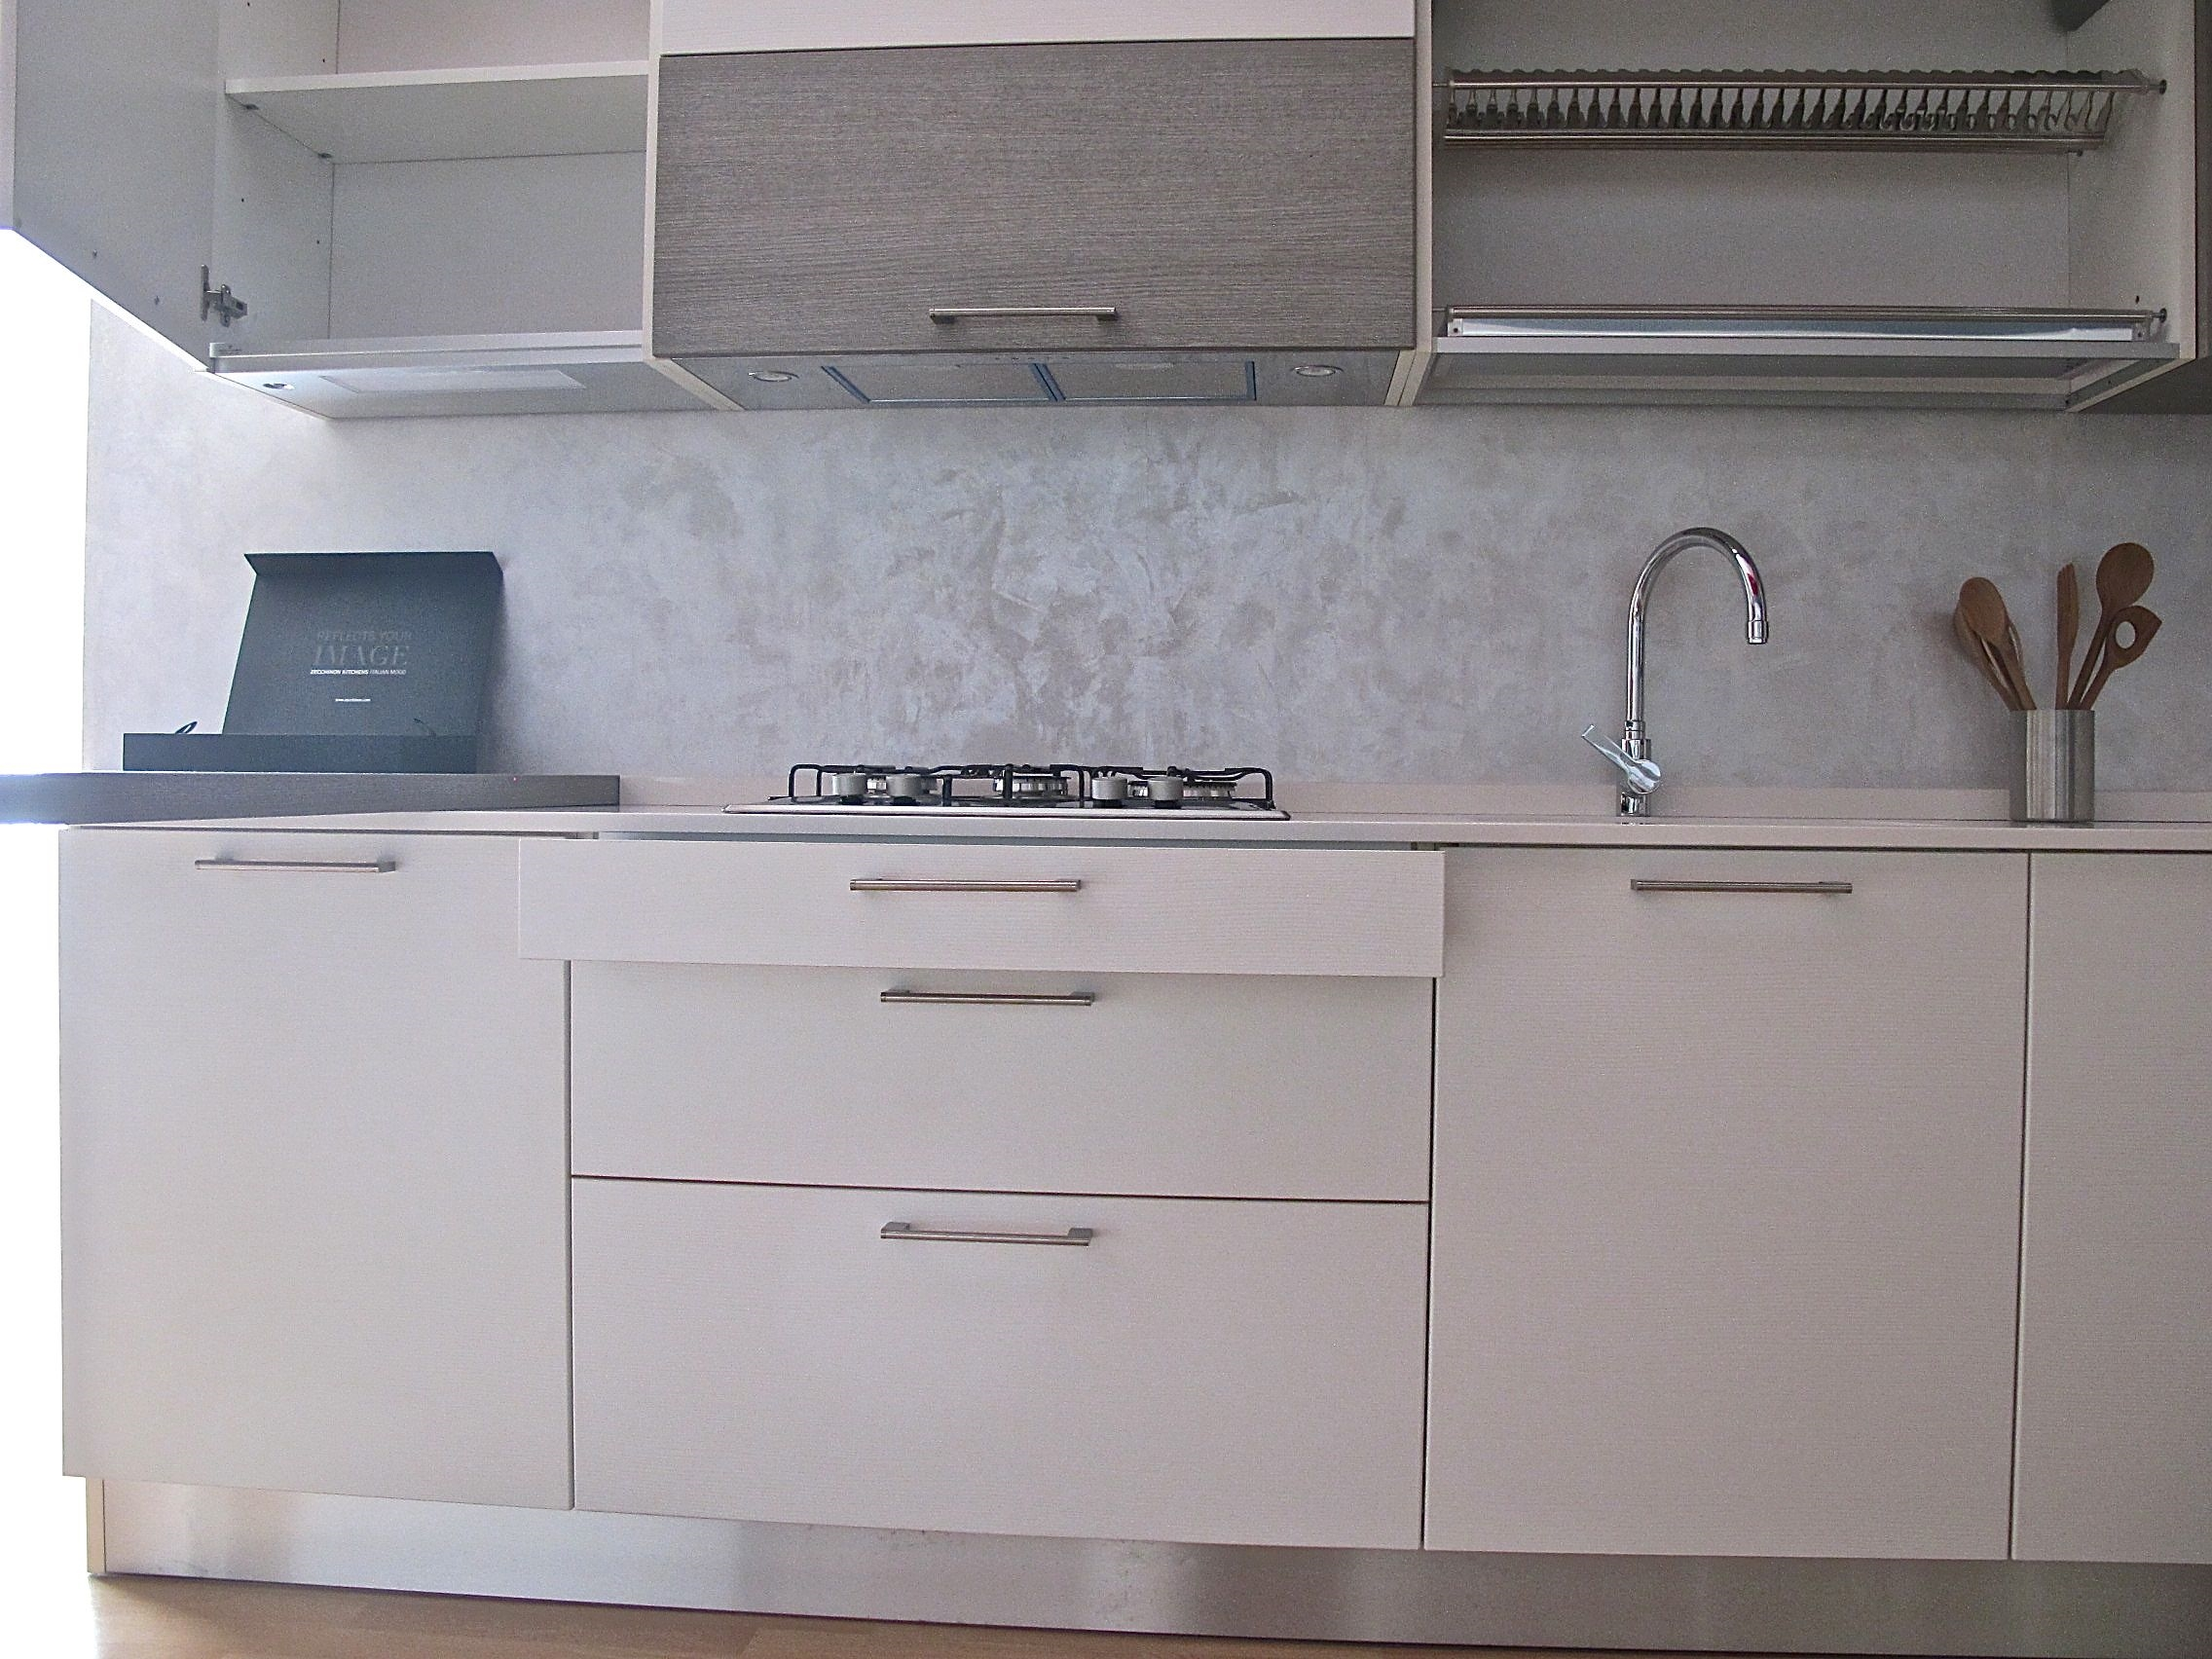 Cucina zecchinon top in quarzo sconto 60 cucine a - Top cucina in quarzo prezzi ...